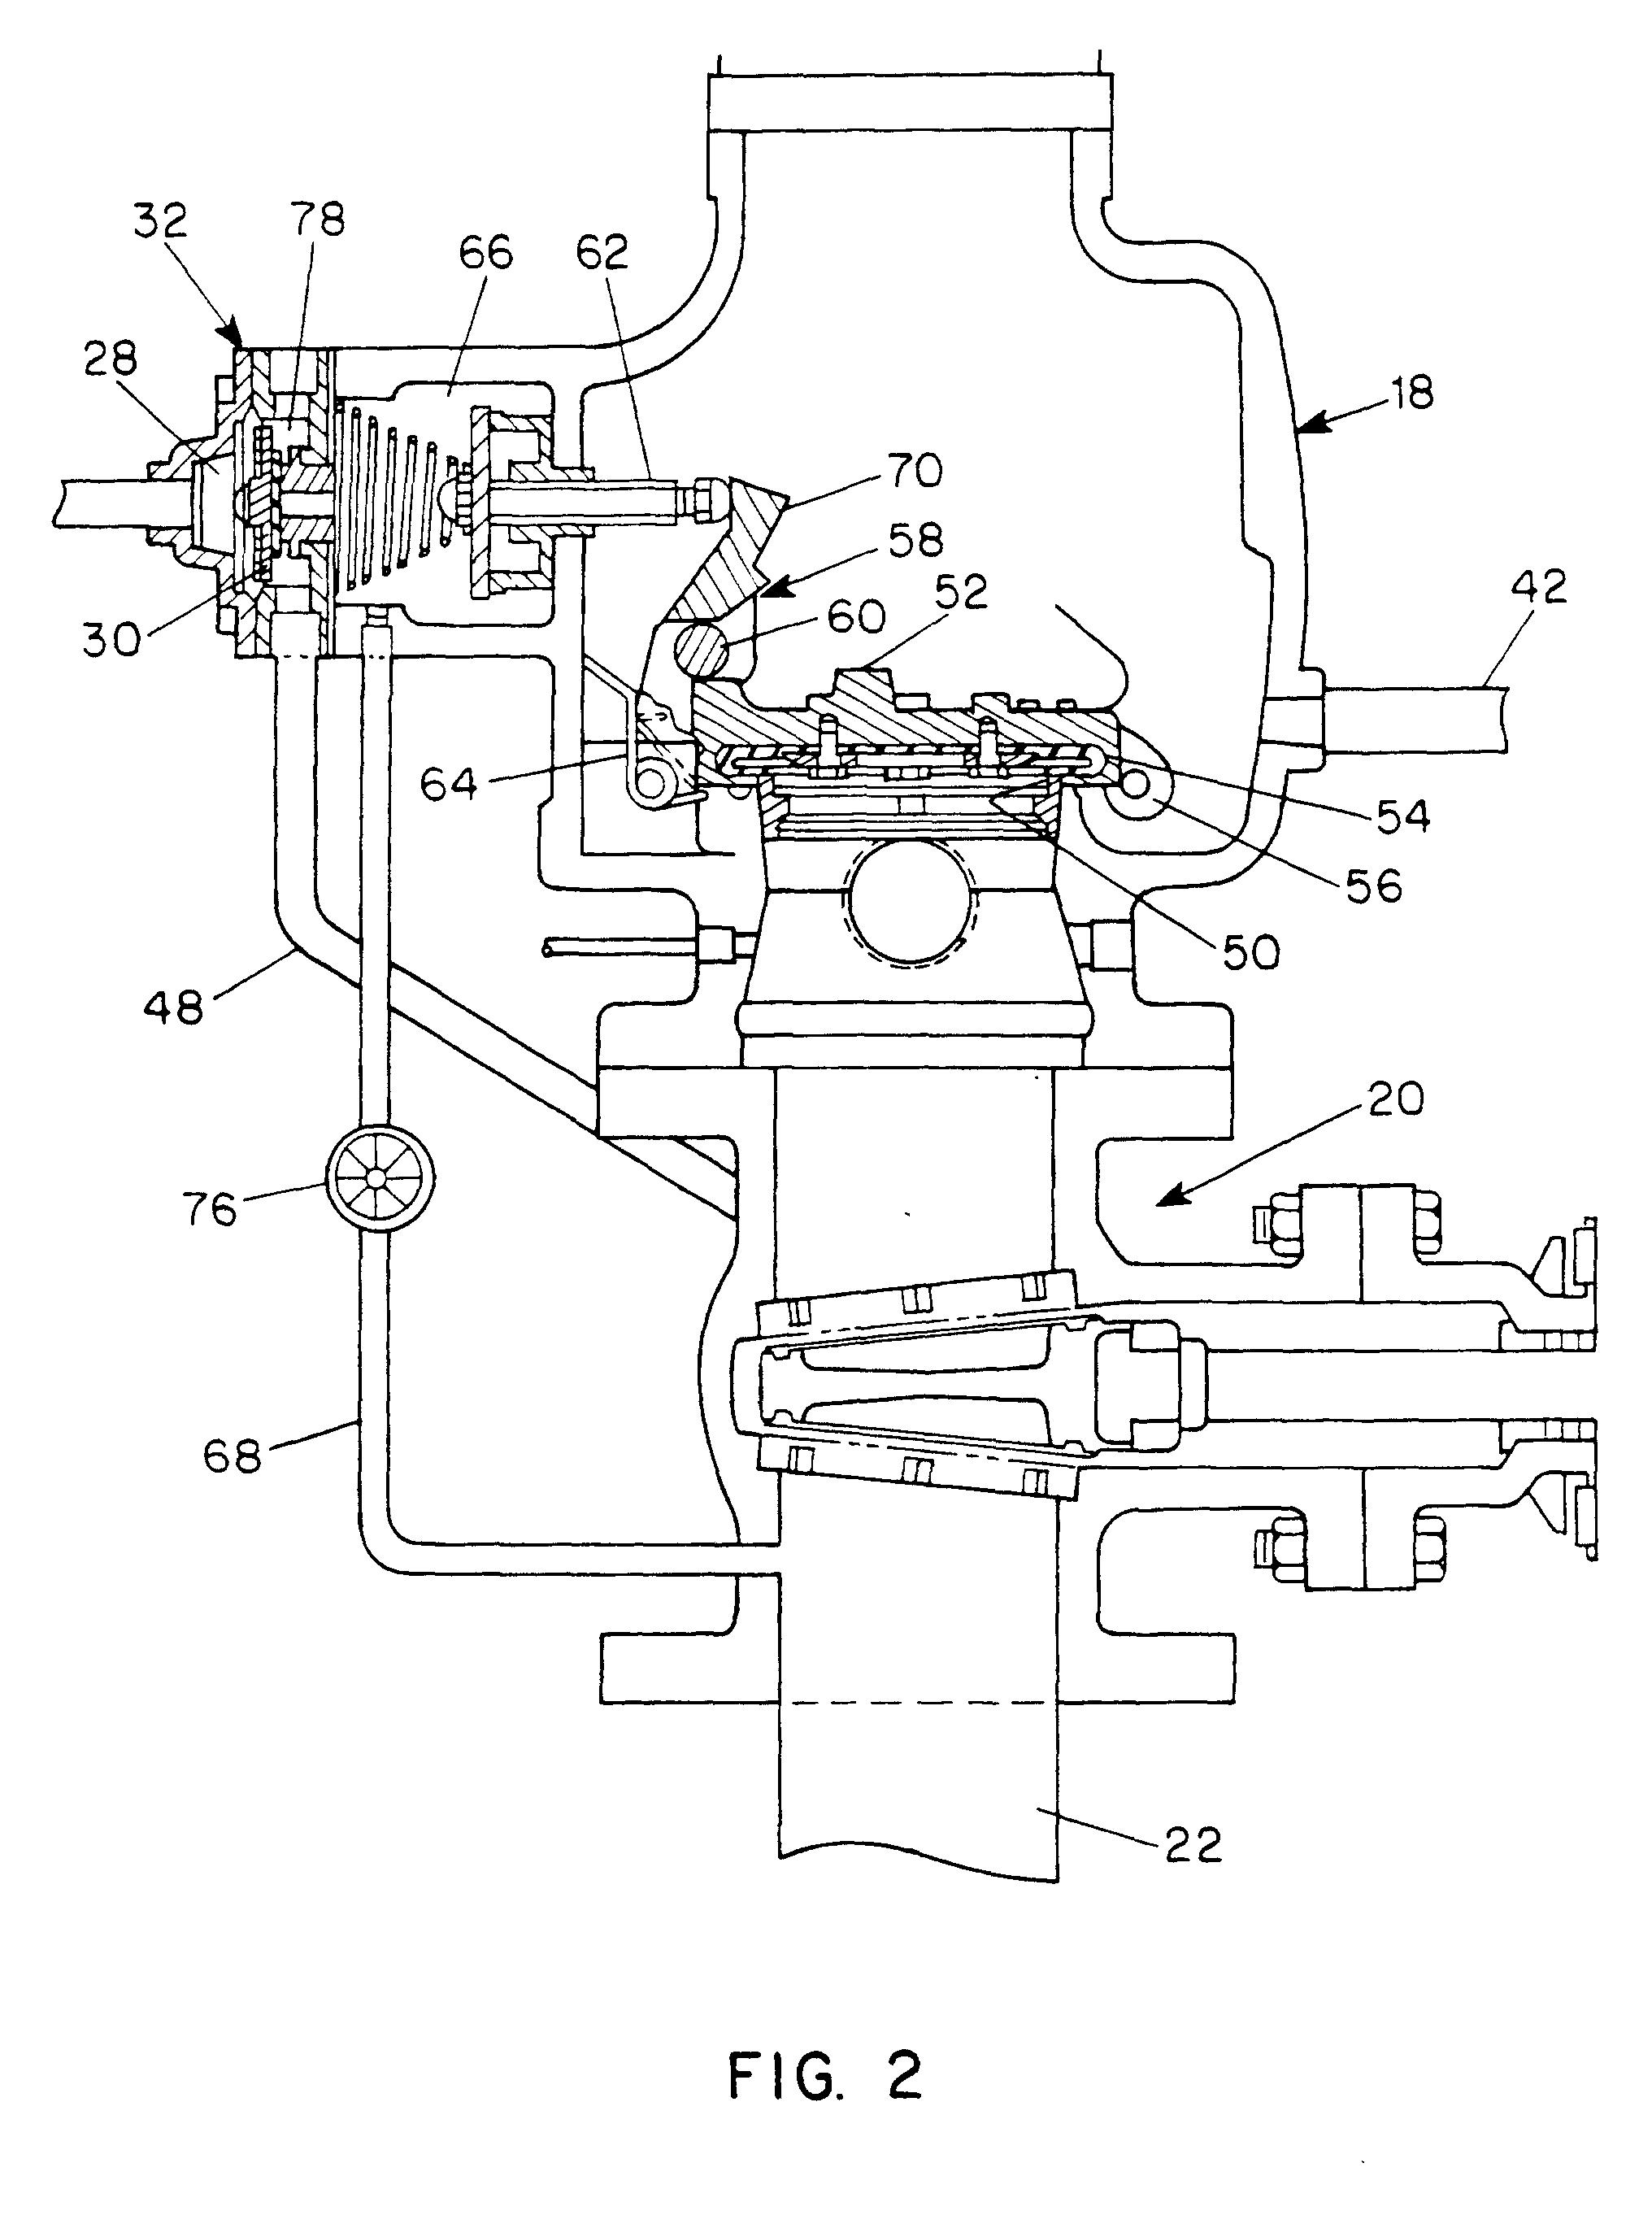 2001 Pontiac Lesabre Radio Wiring Diagram as well Car Stereo   Wiring Diagram Audio likewise Pontiac G6 Wiring Diagram Radio additionally Pontiac G6 Glove Box Diagram additionally 2006 Grand Prix Wiring Diagram. on 2006 pontiac g6 stereo amp wiring diagram